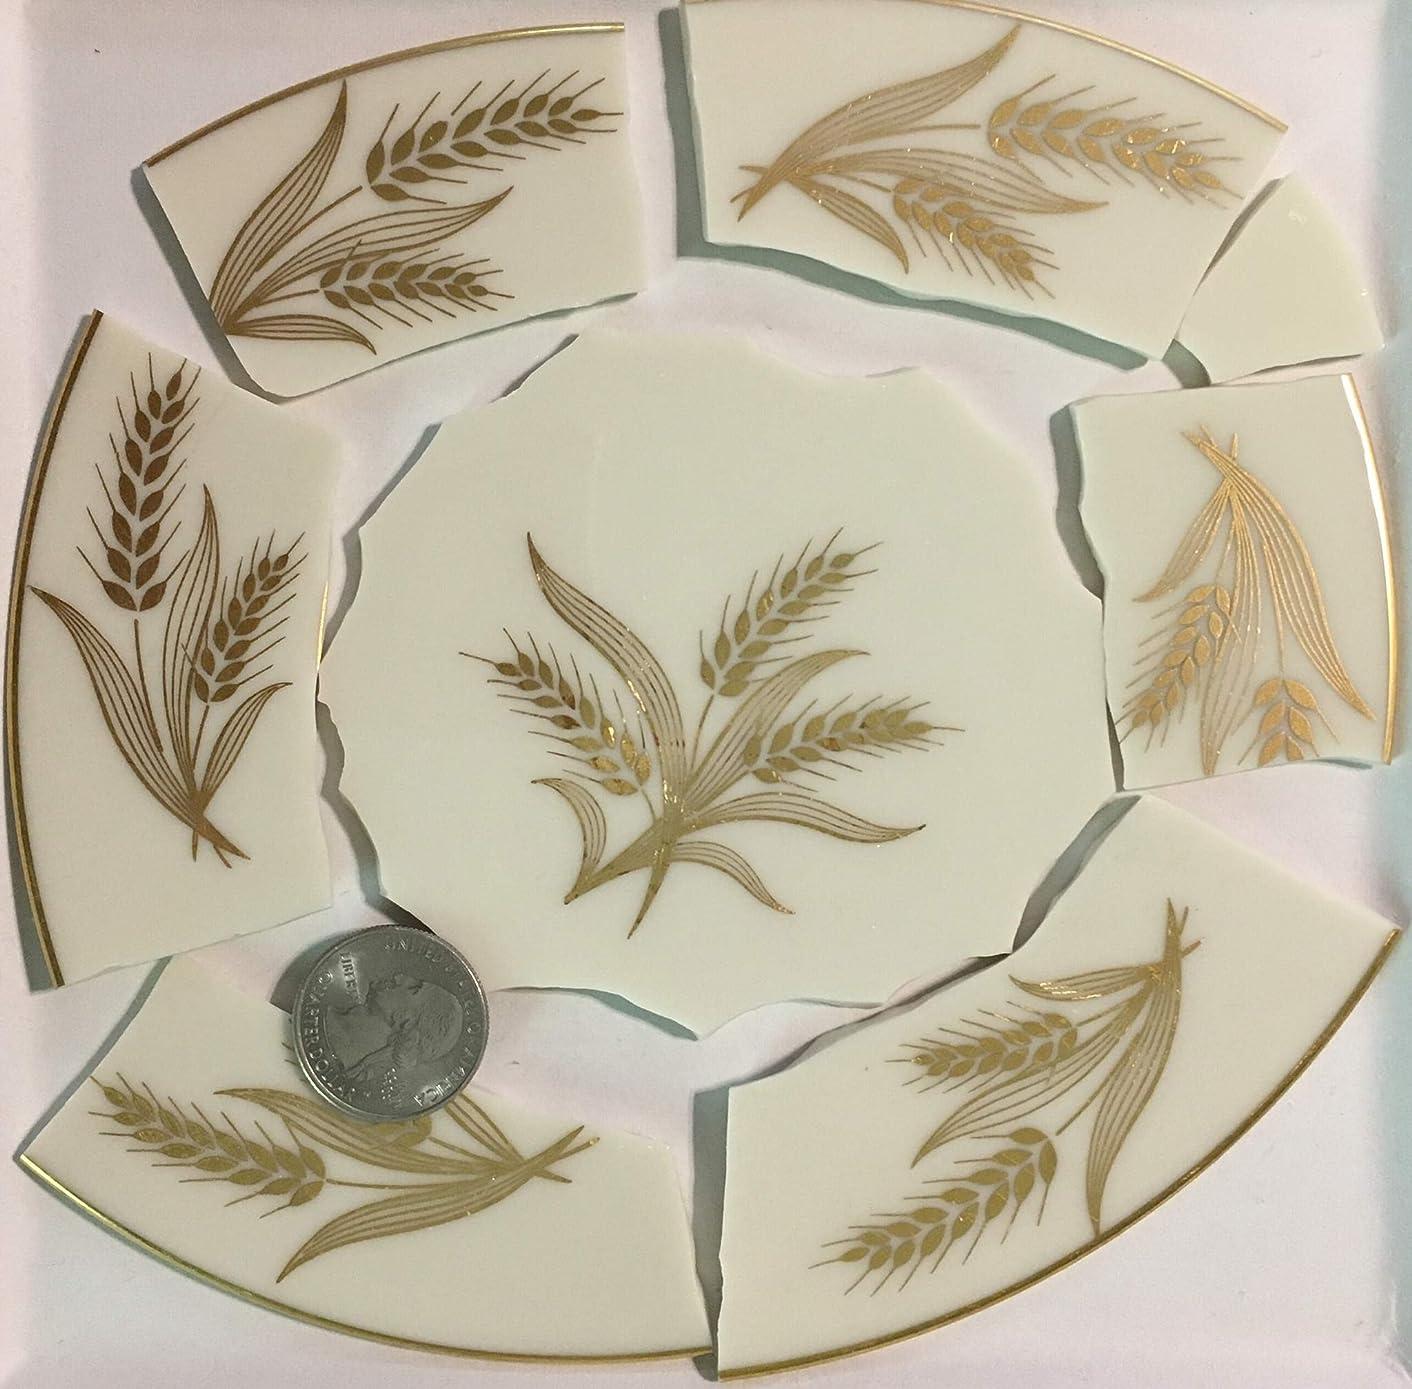 Mosaic Art & Crafts Supply ~ Metallic Gold Wheat Design Cream White China Tiles (B887)